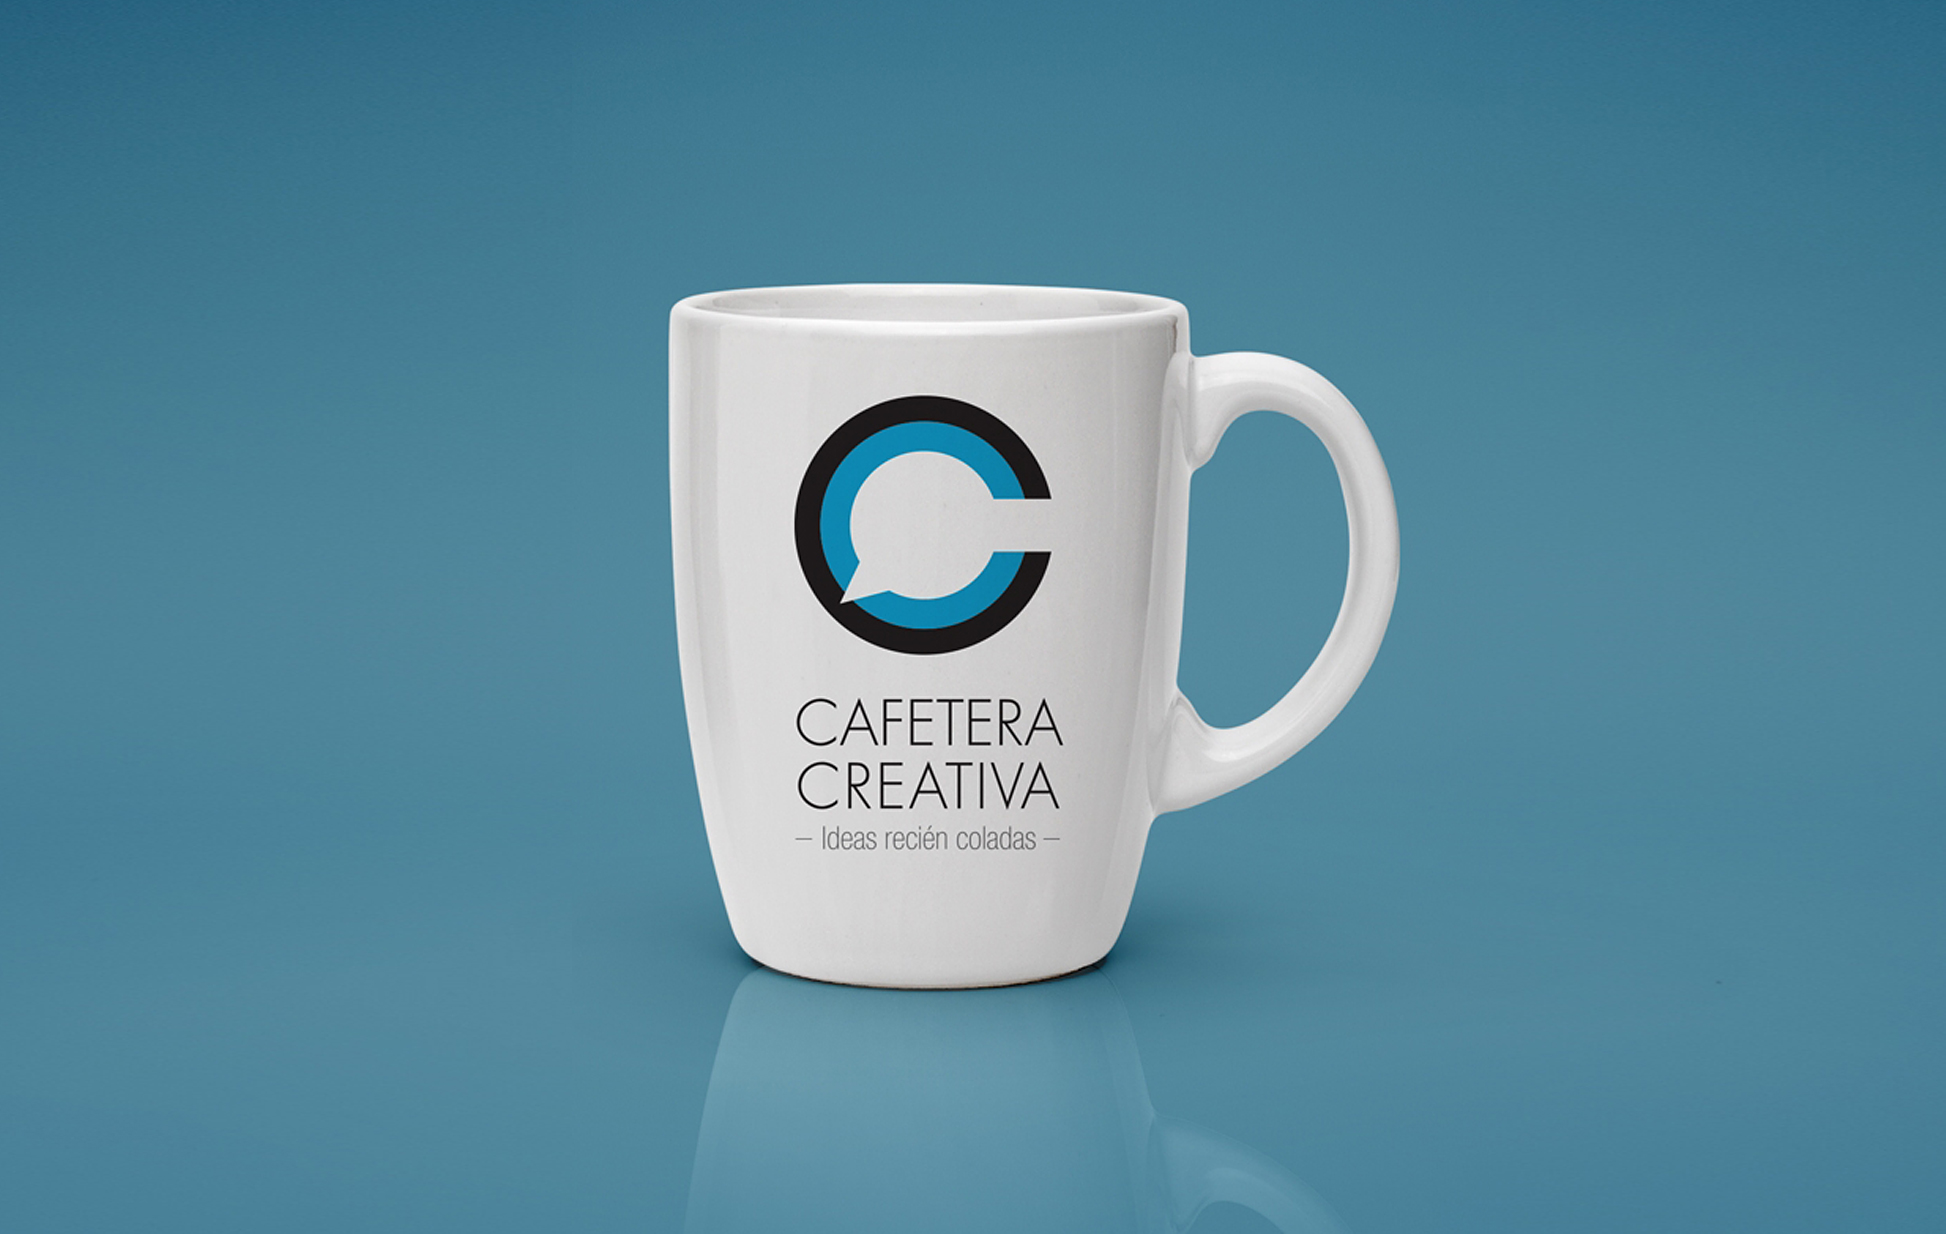 cafetera creativa